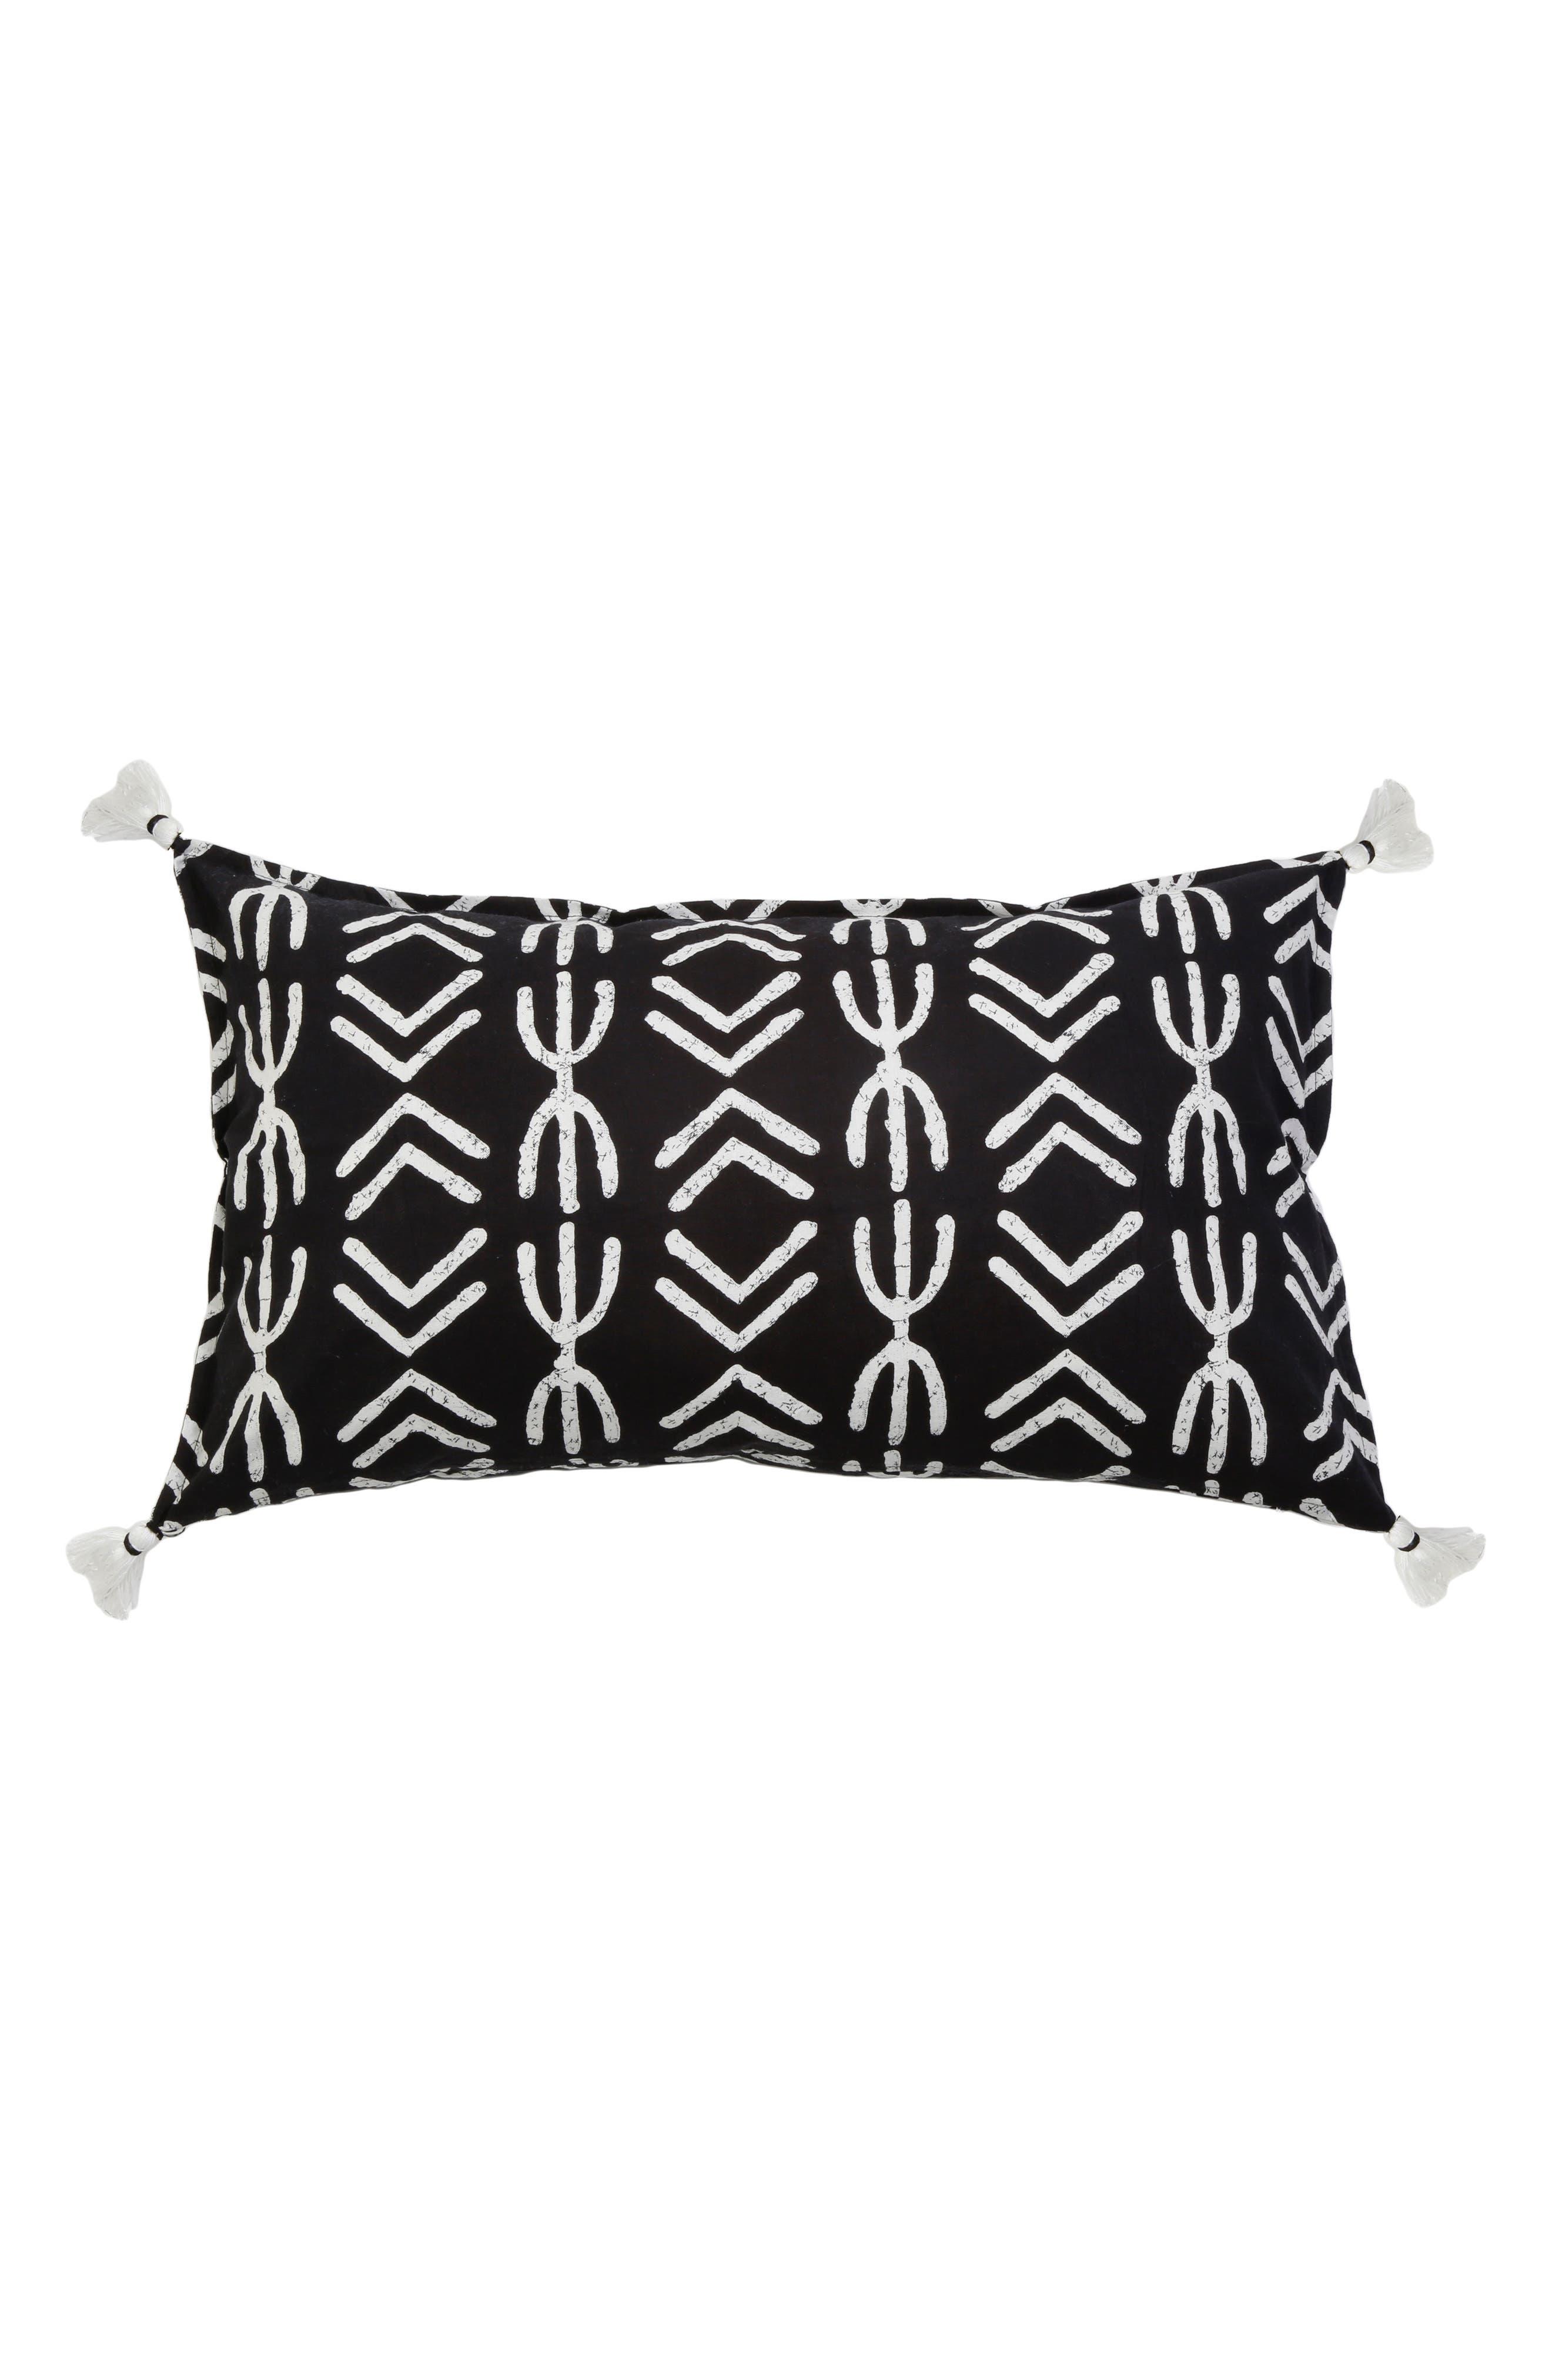 Spear Accent Pillow,                         Main,                         color, Black Multi